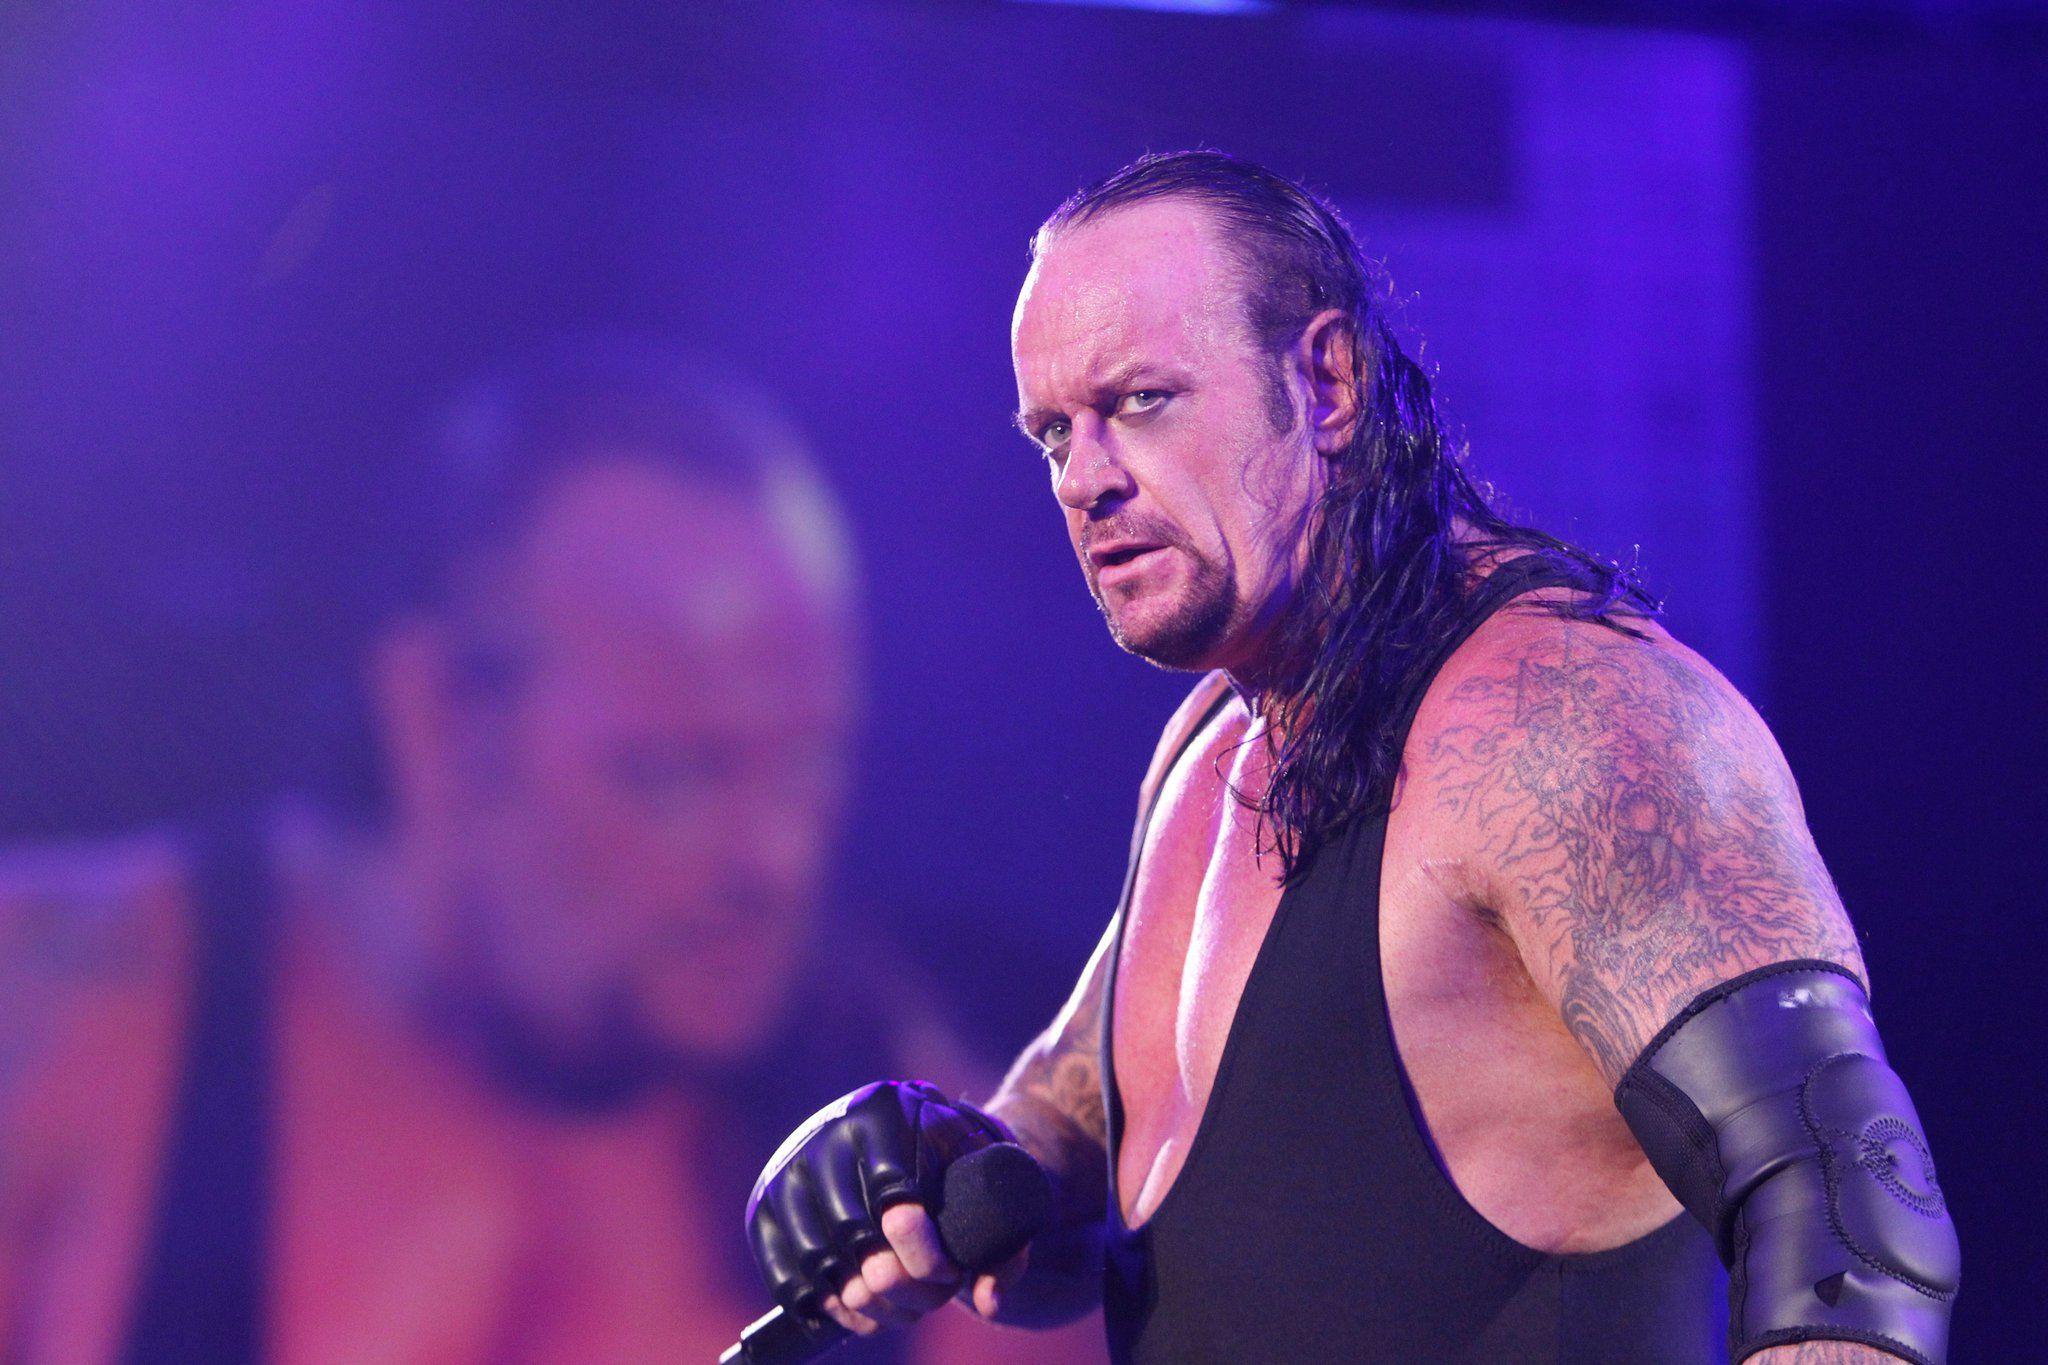 9. The Undertaker - Net Worth: $16 million